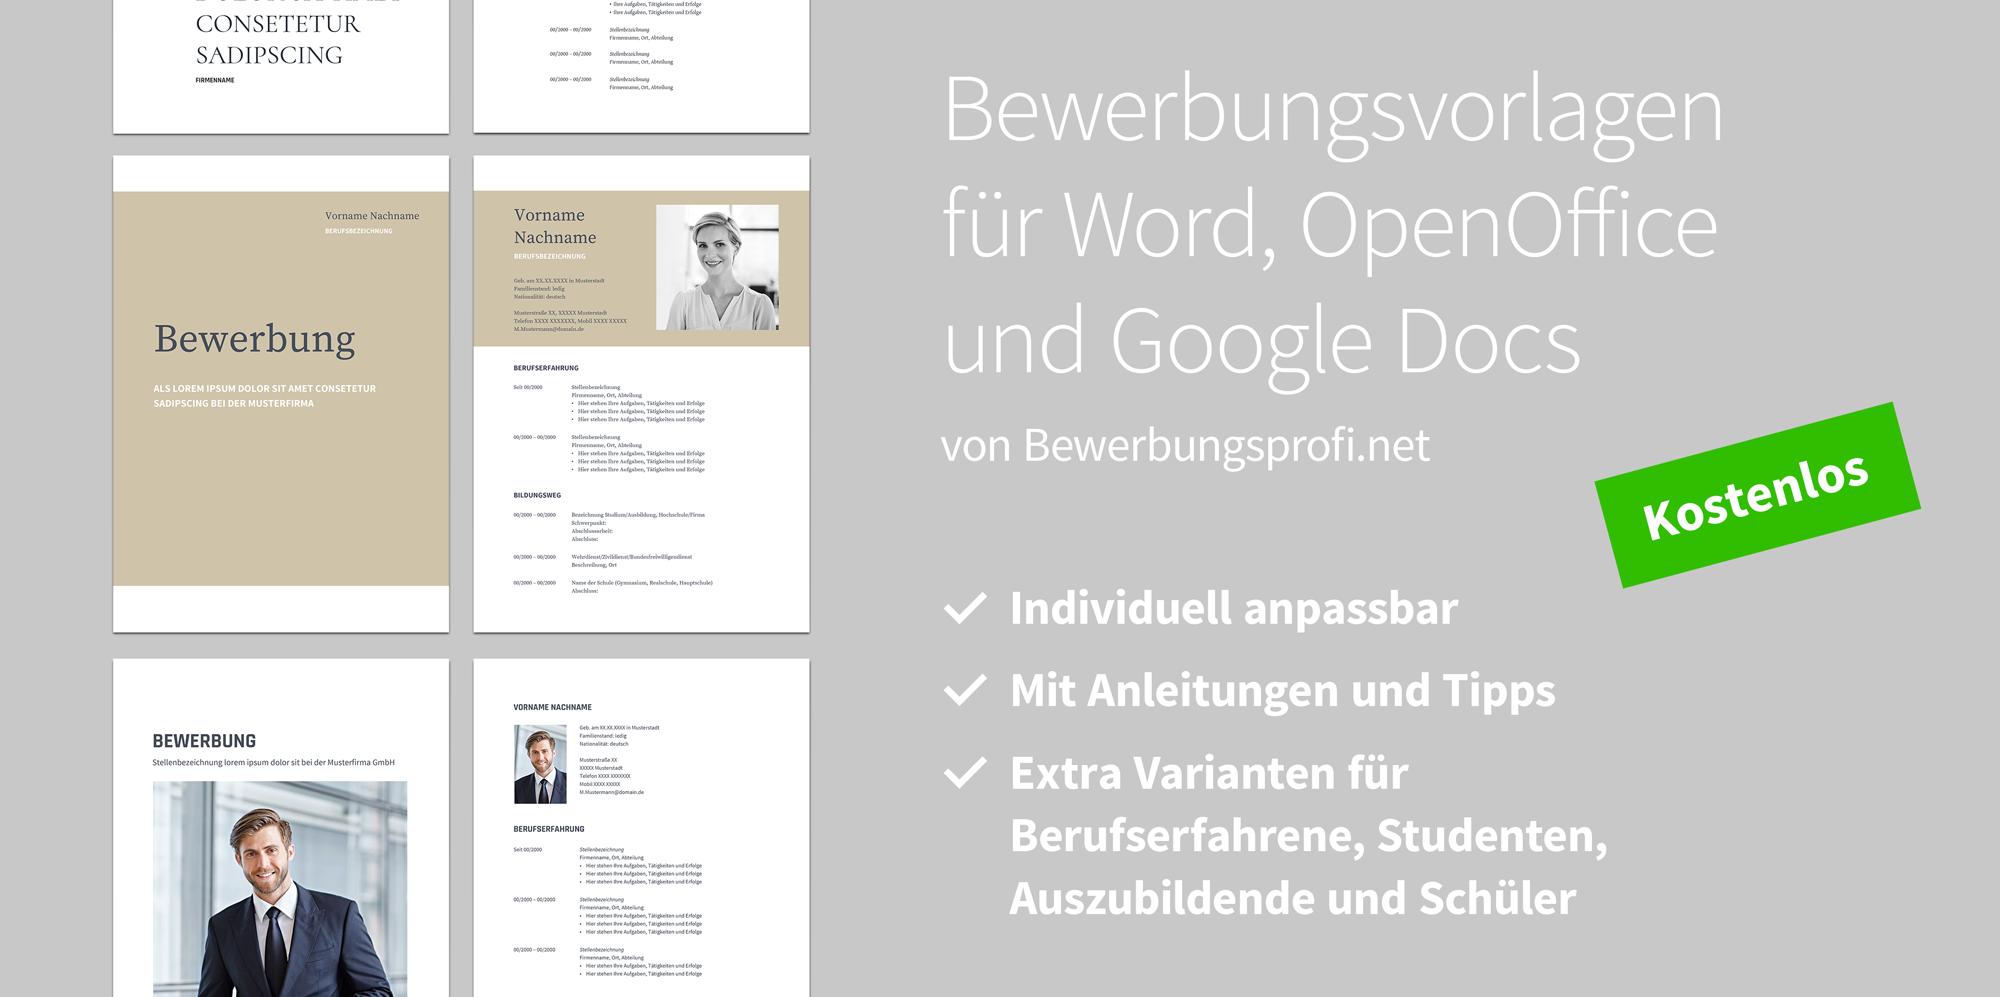 Bewerbung Vorlagen Word OpenOffice Google Docs